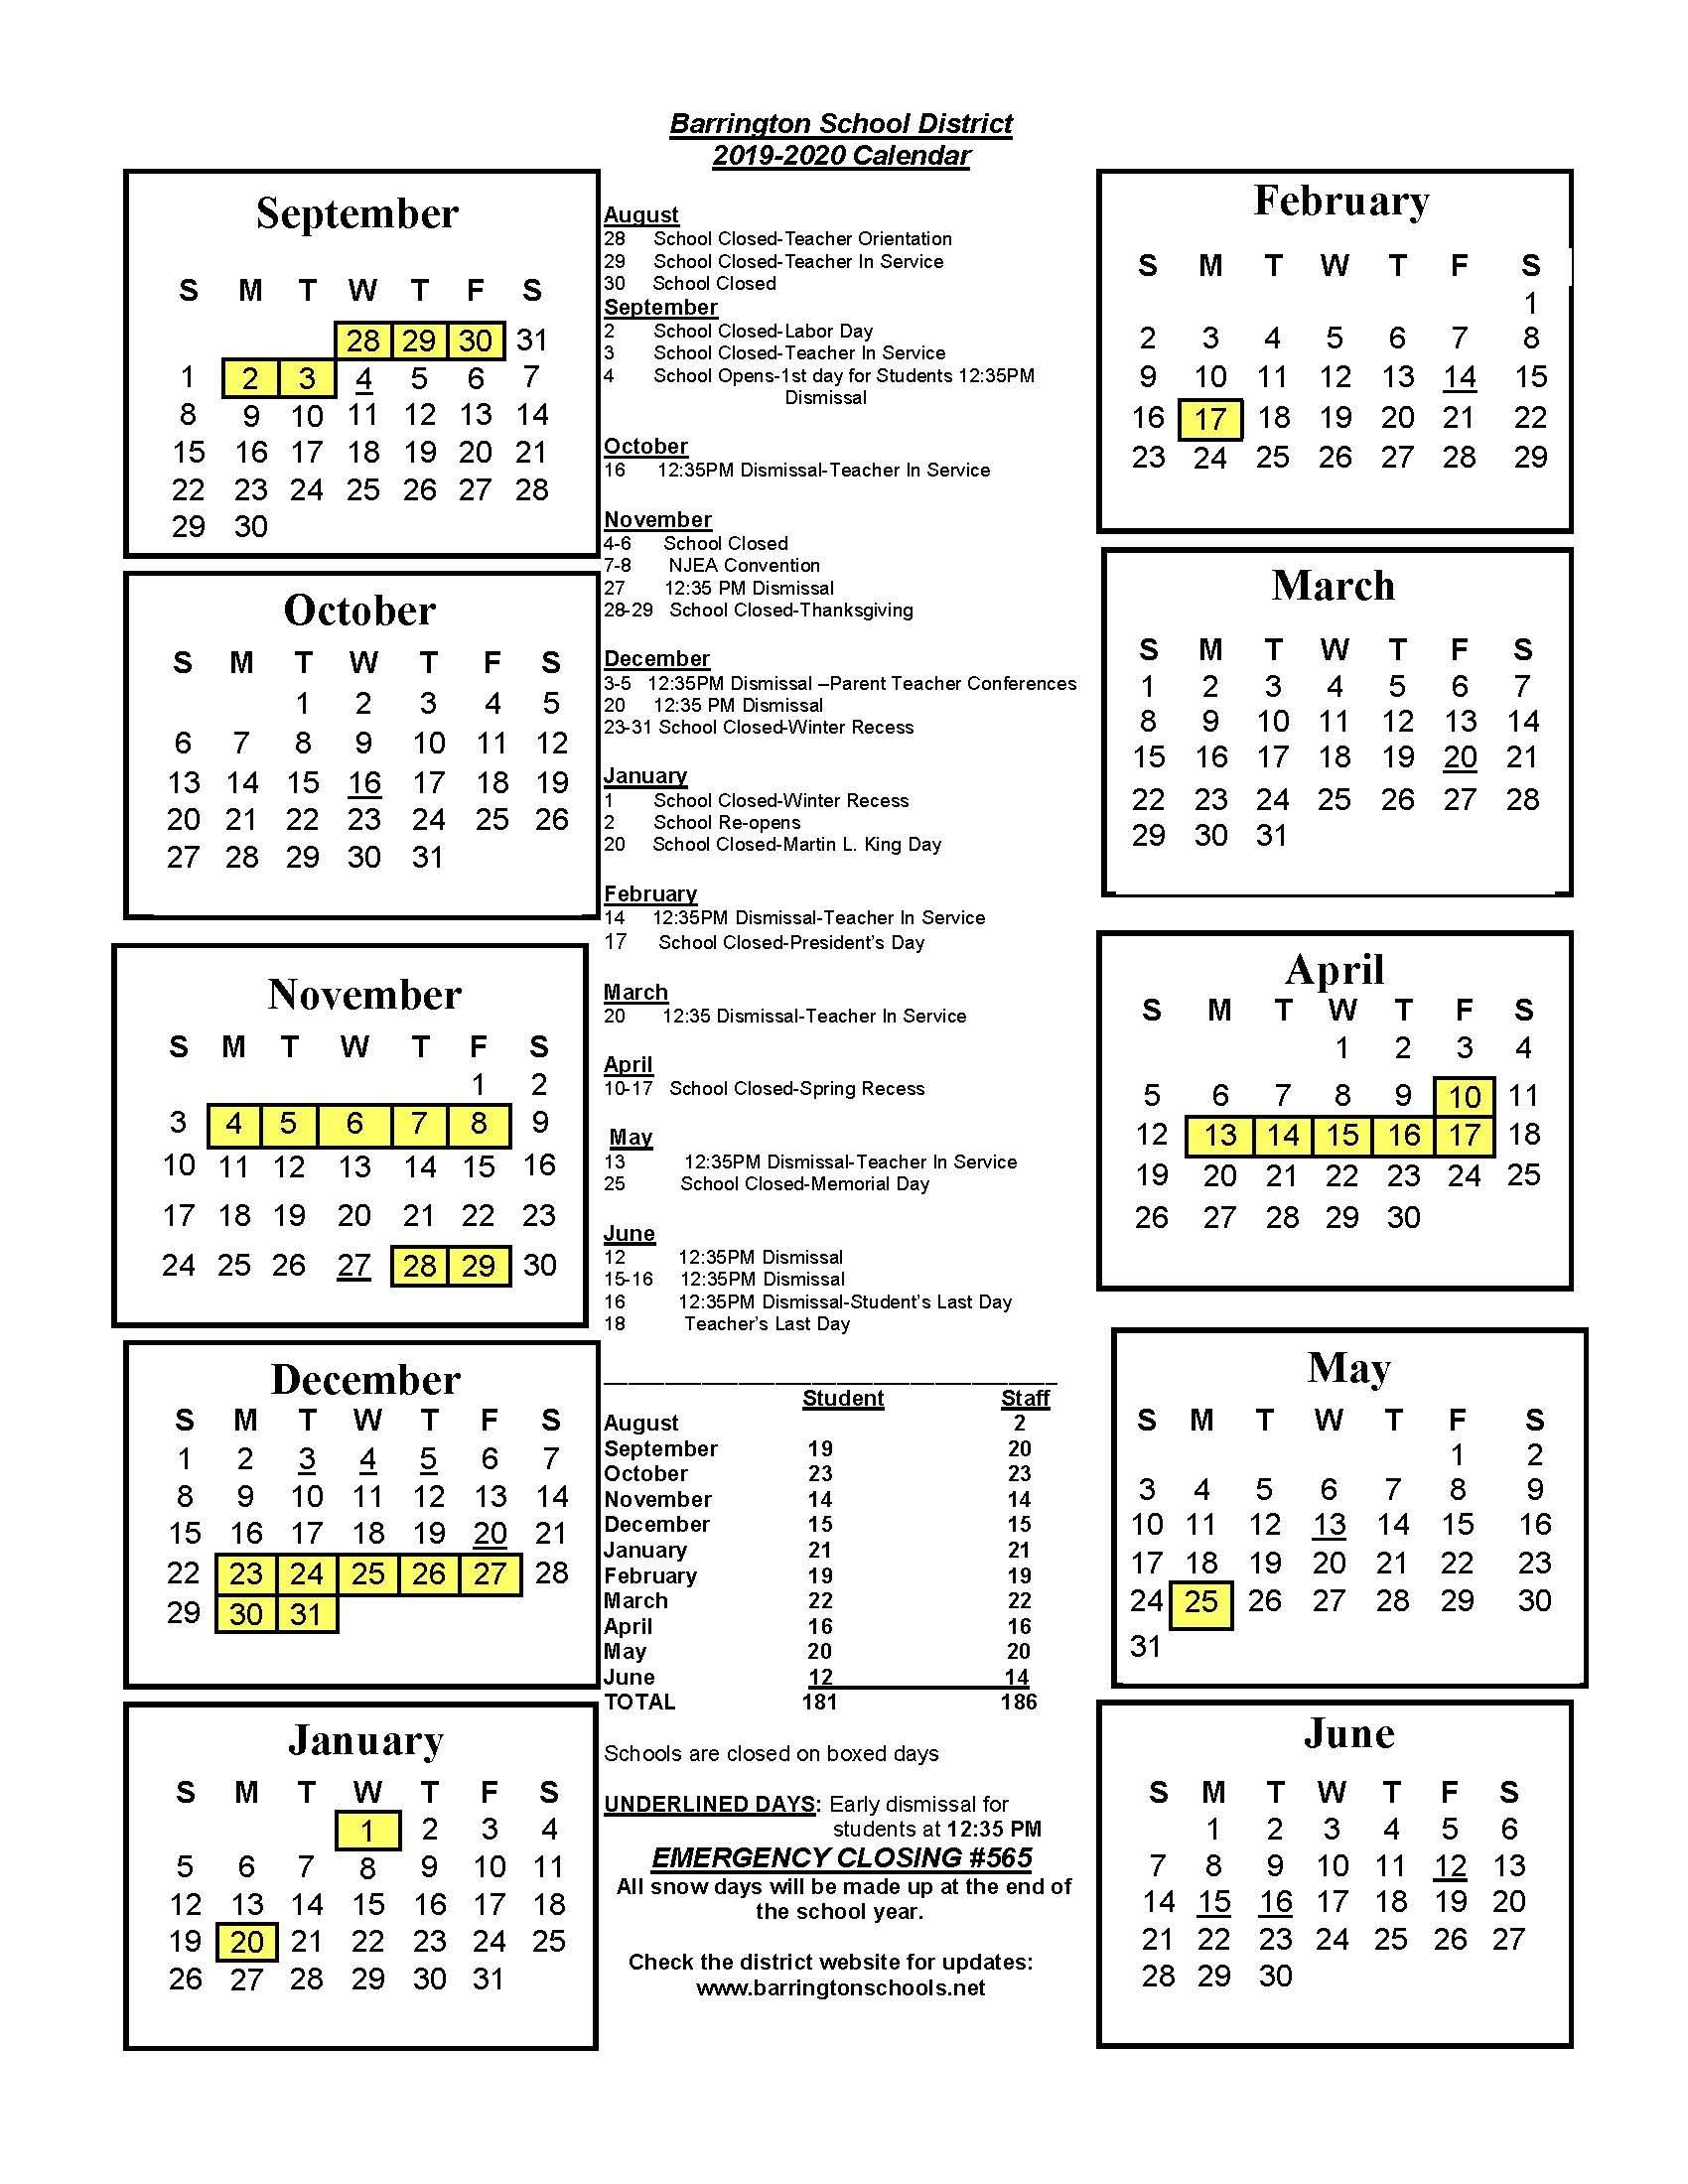 Manheim Township School District Calendar | Printable With Grand Canyon University Calendar 2021 2020